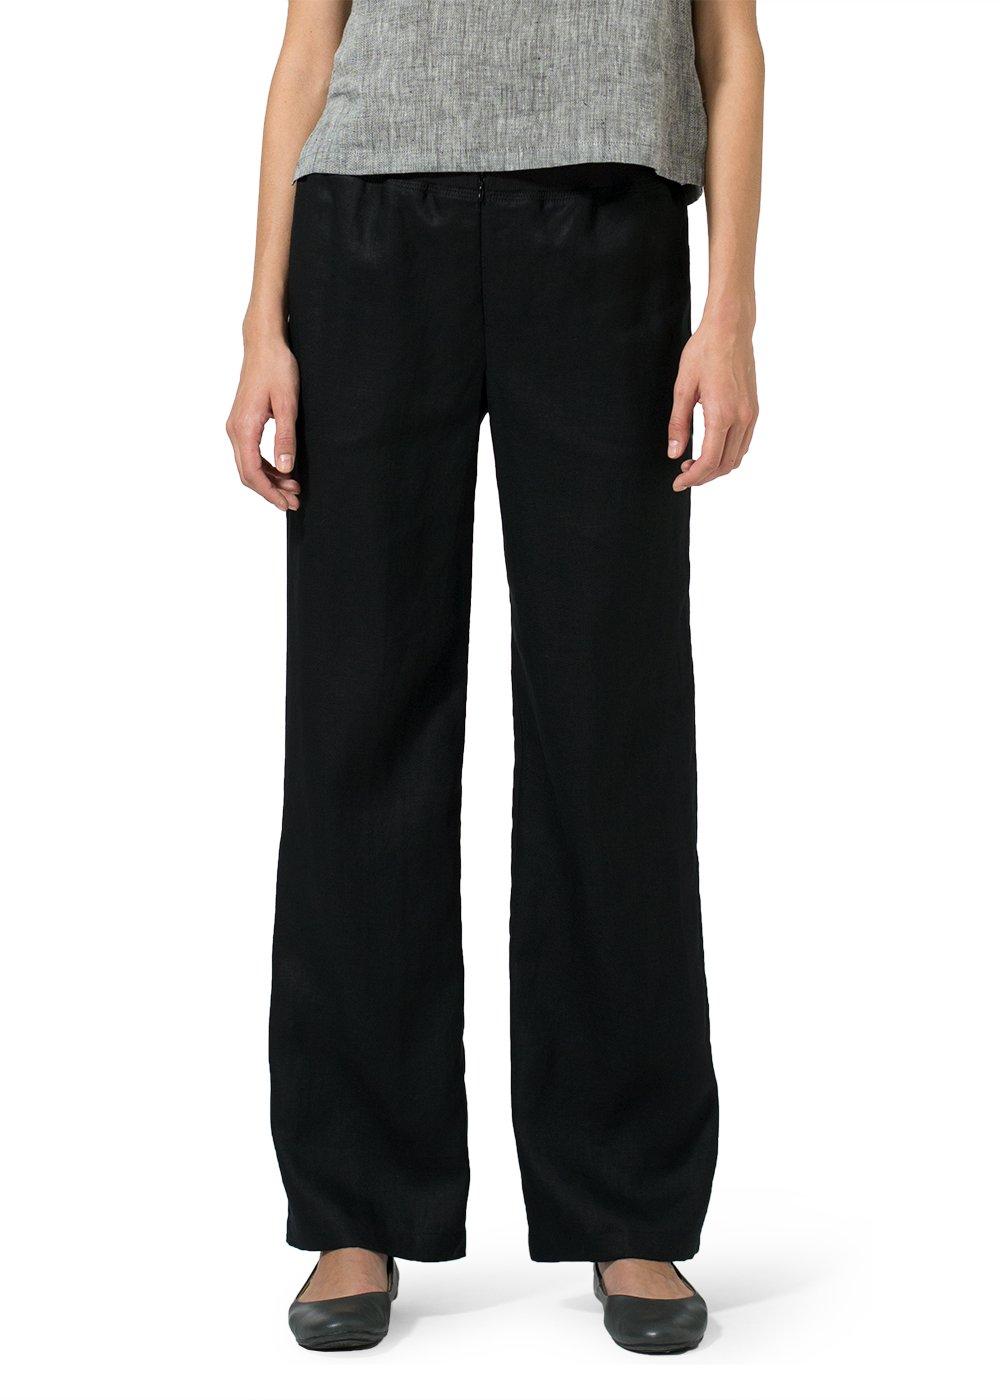 Vivid Linen Long Straight Leg Pants-M-Black